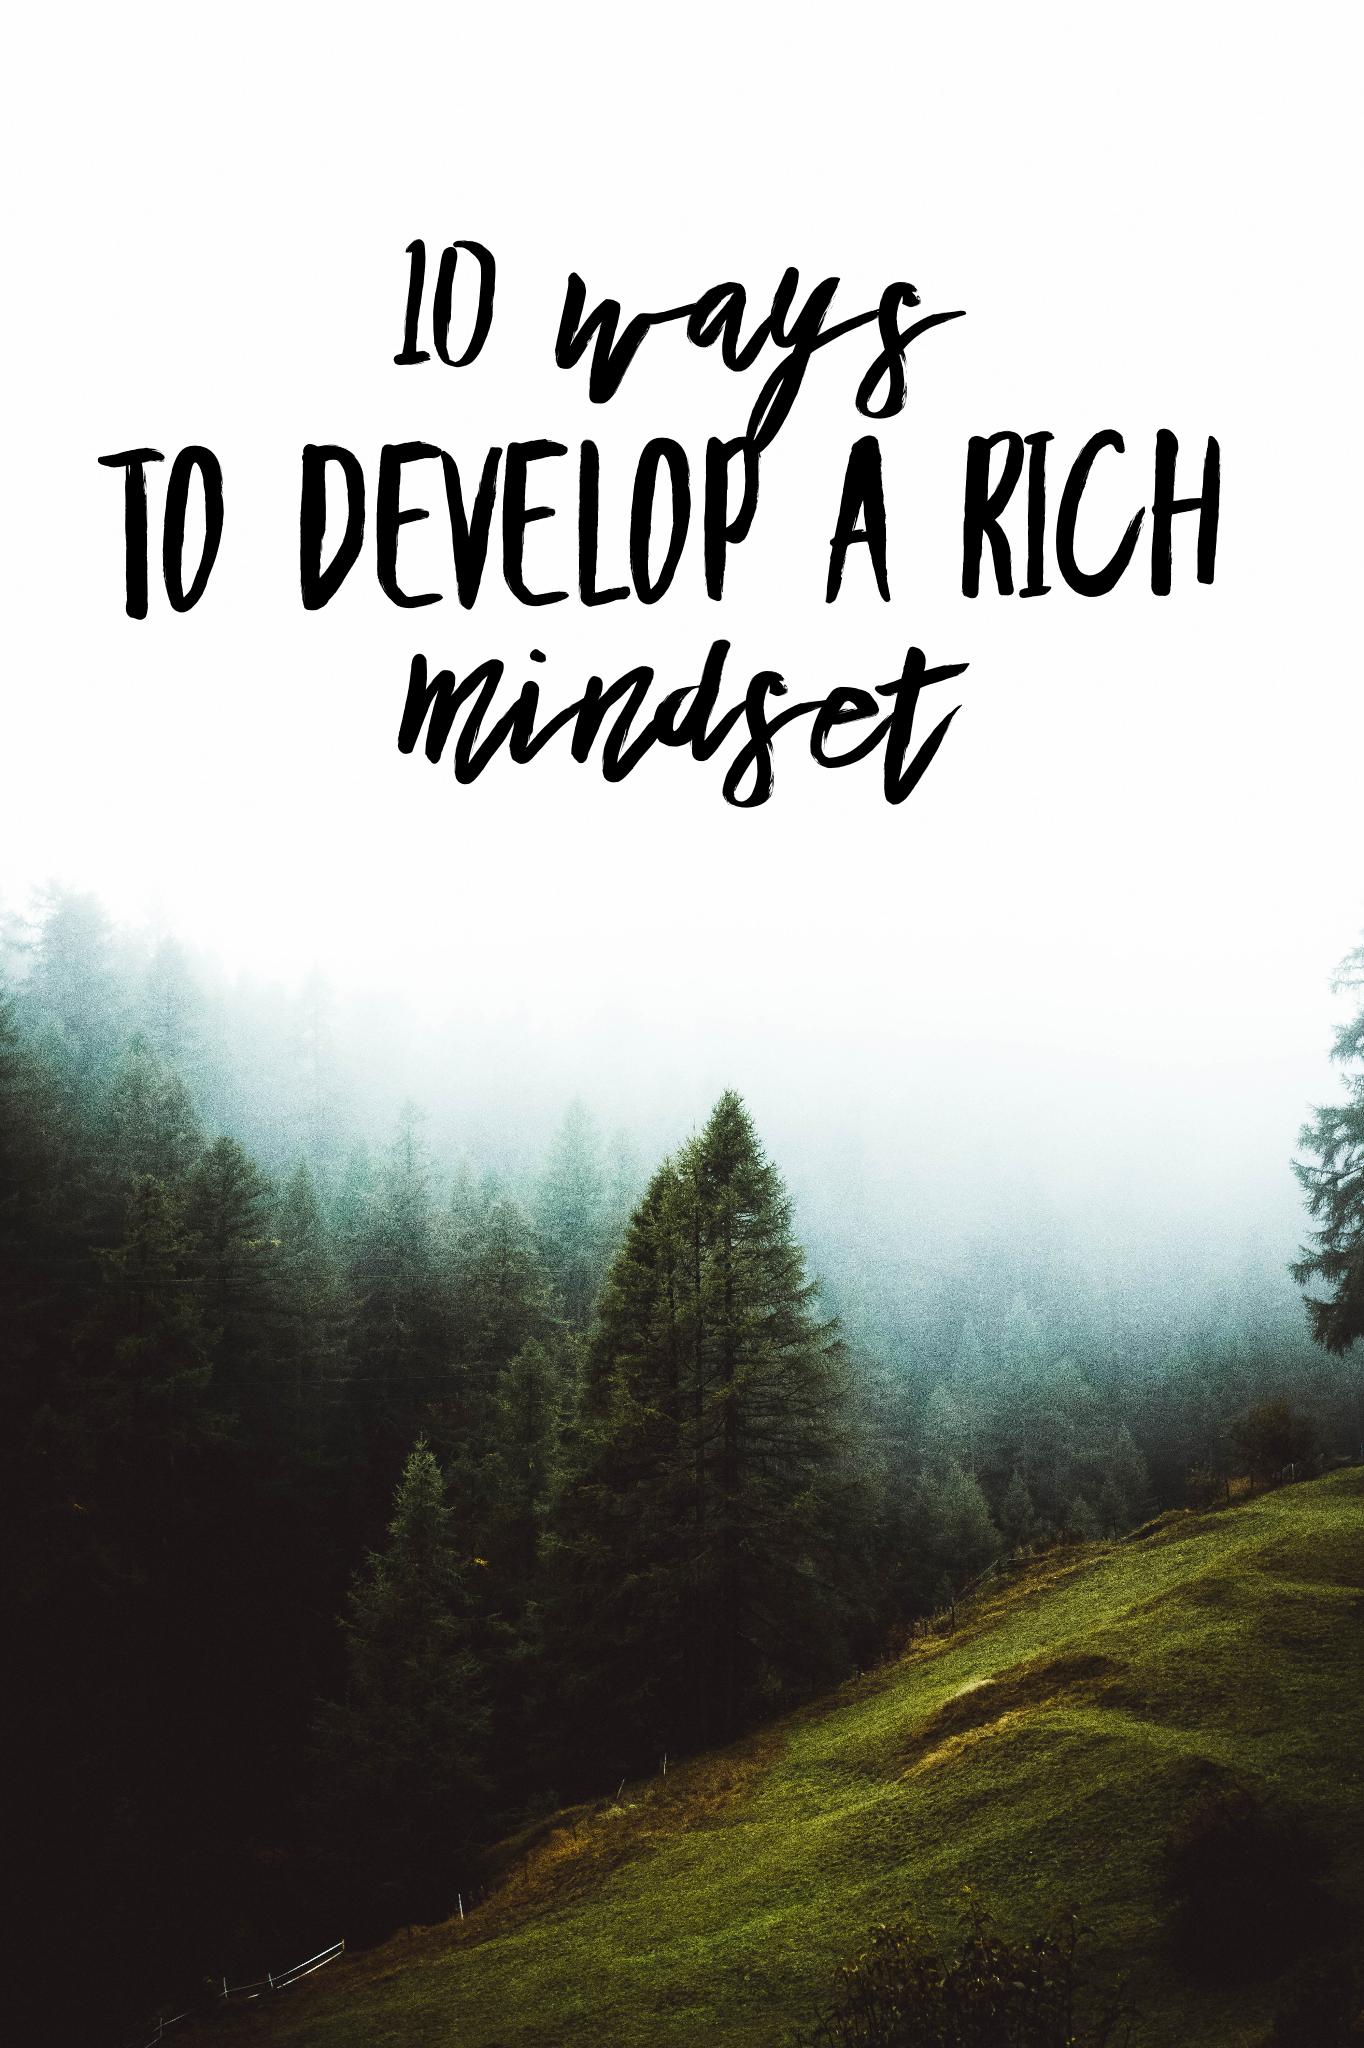 10 Ways to Develop a Rich Mindset